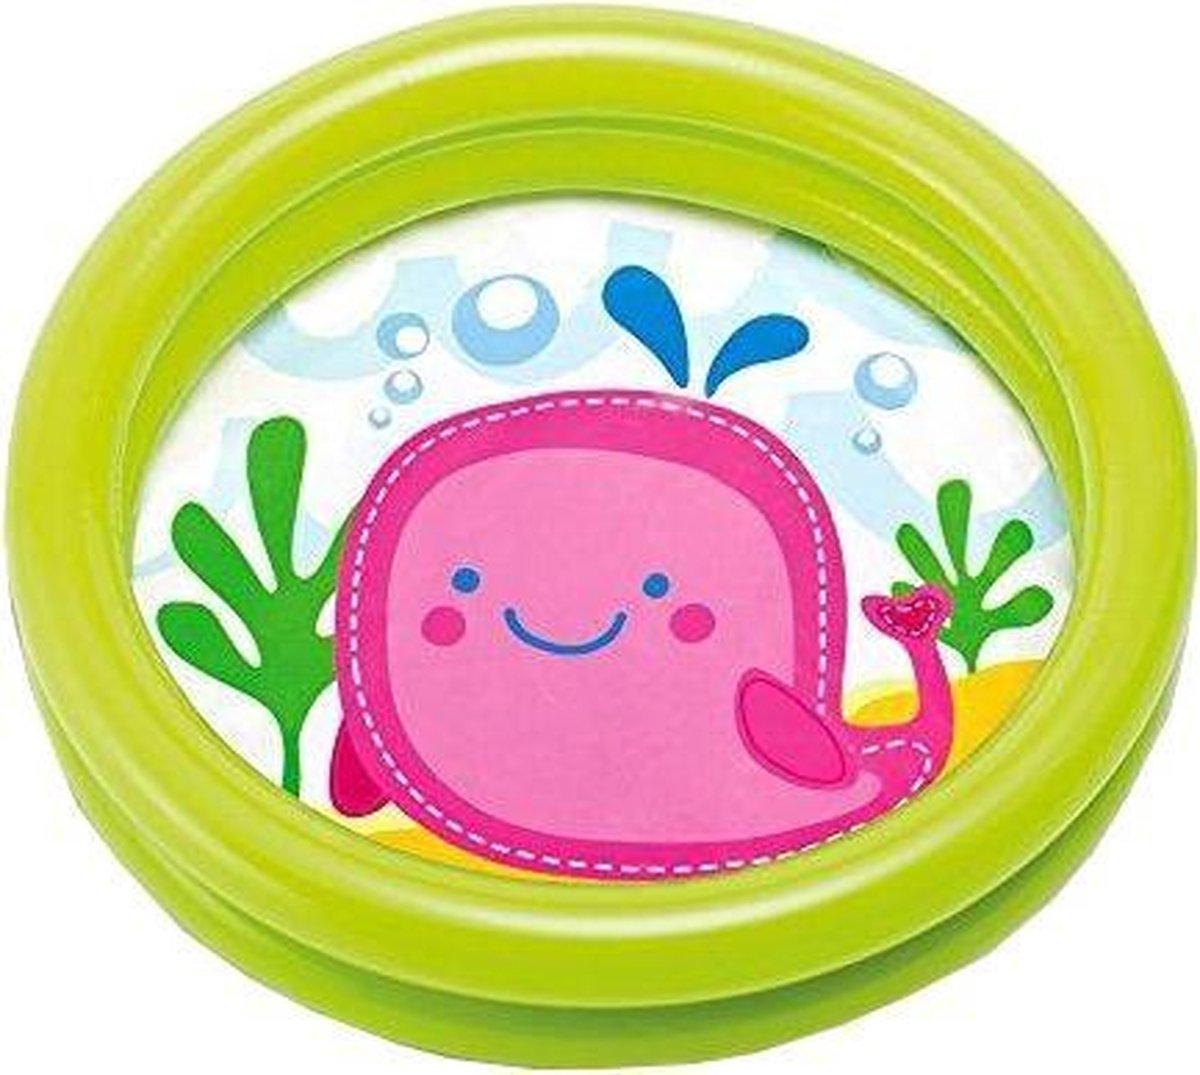 Intex Opblaasbaar Babybadje Groen 61 Cm X 15 Cm